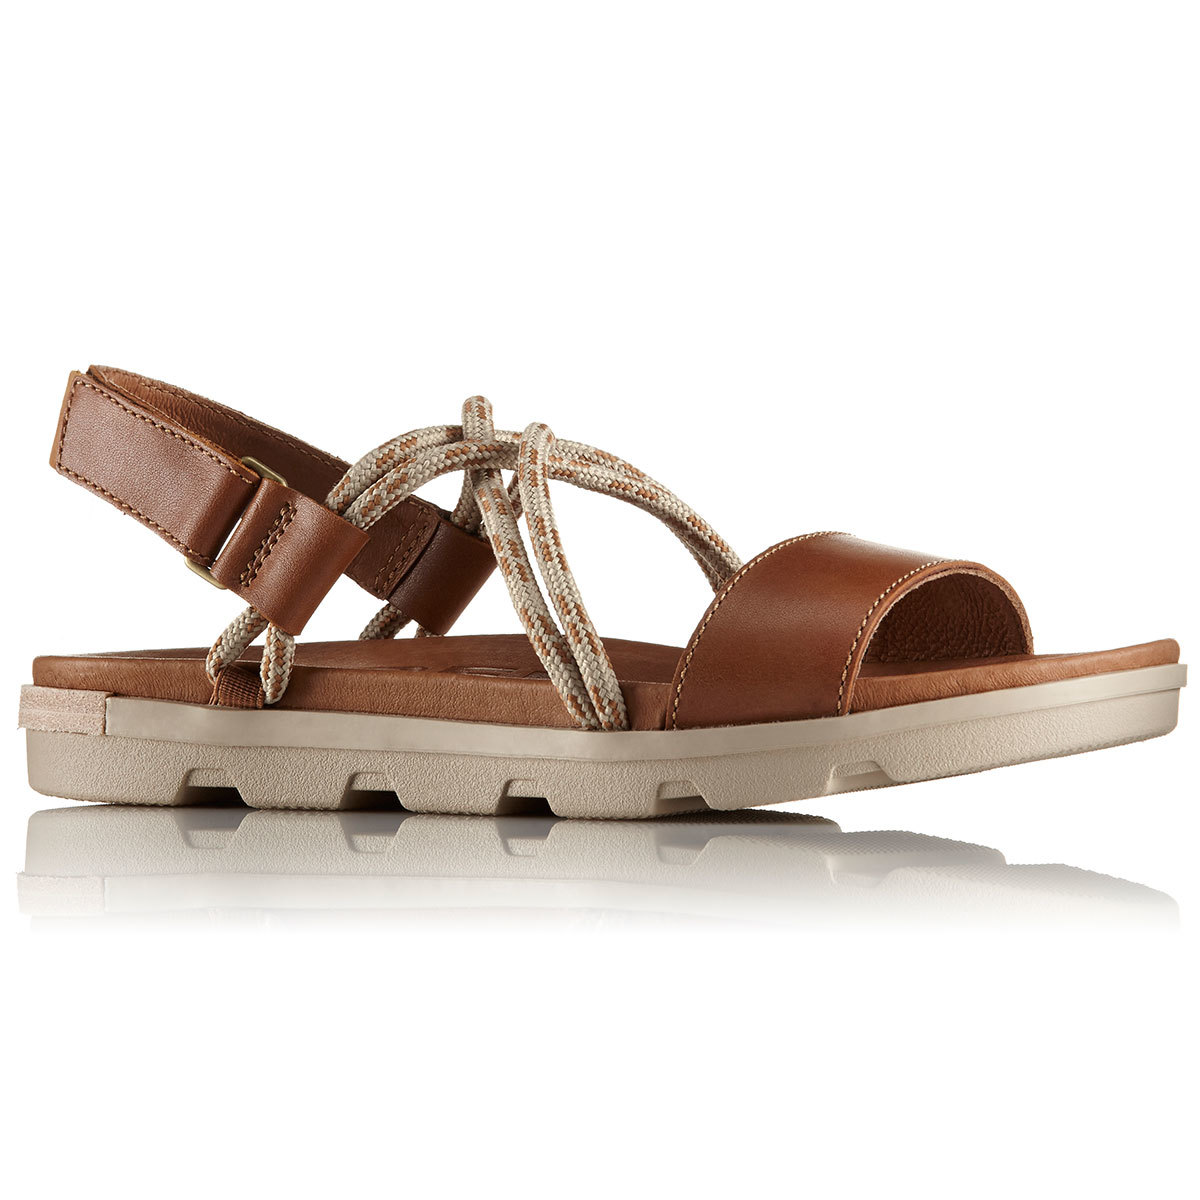 Sorel Women's Torpeda Ii Sandals - Brown, 6.5